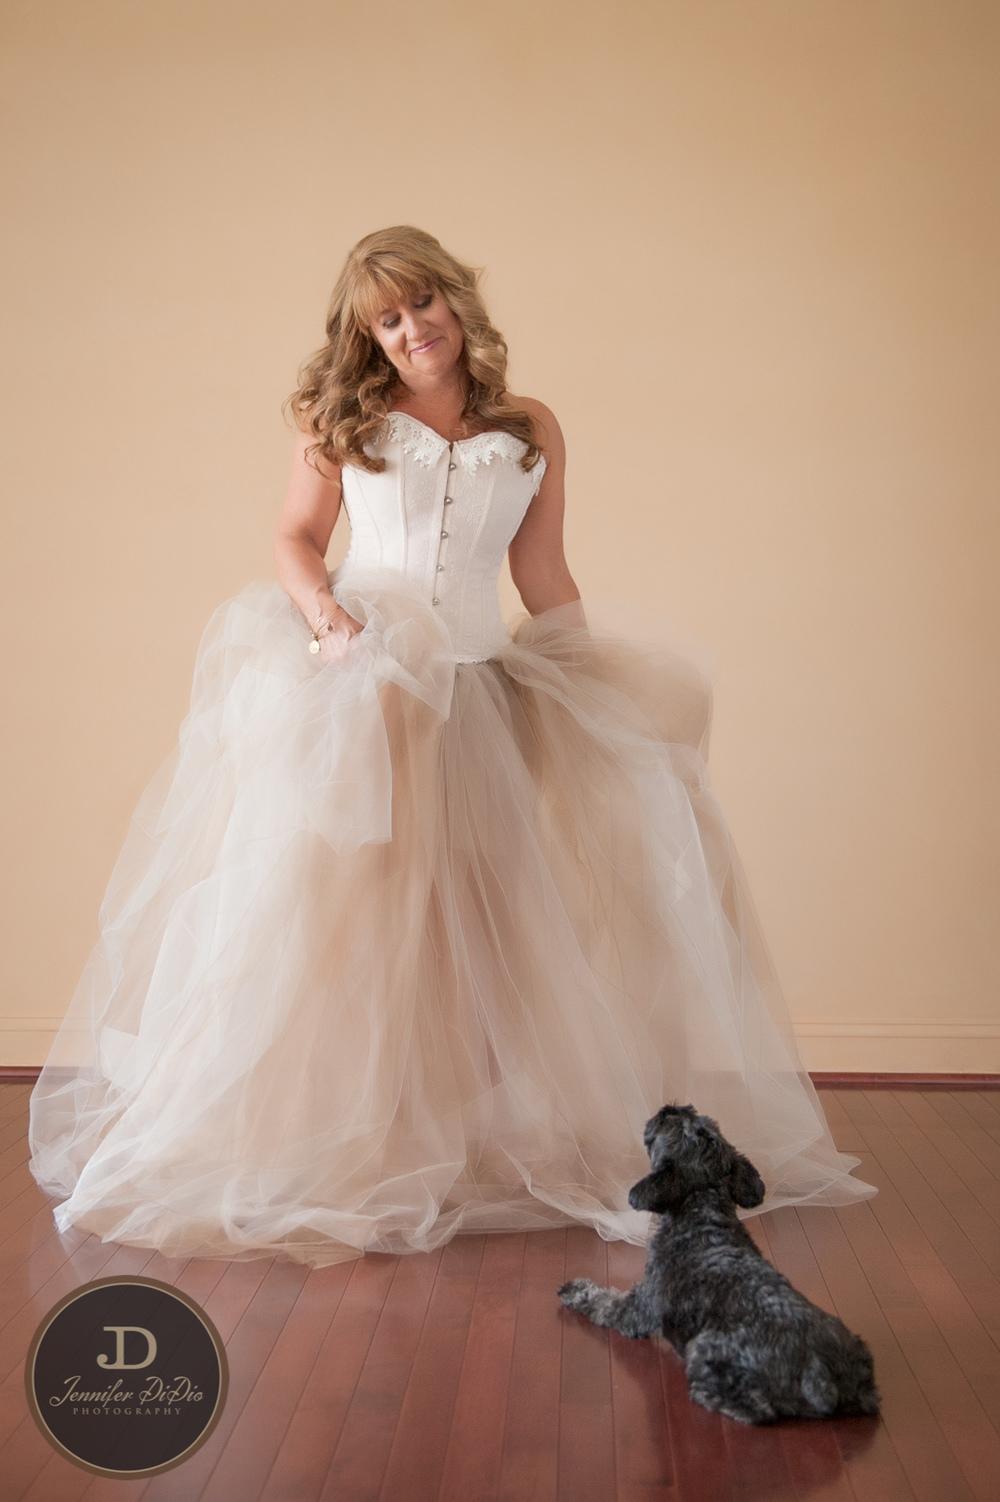 Jennifer.DiDio.Photography.Rosner.Jill.2014-106.jpg